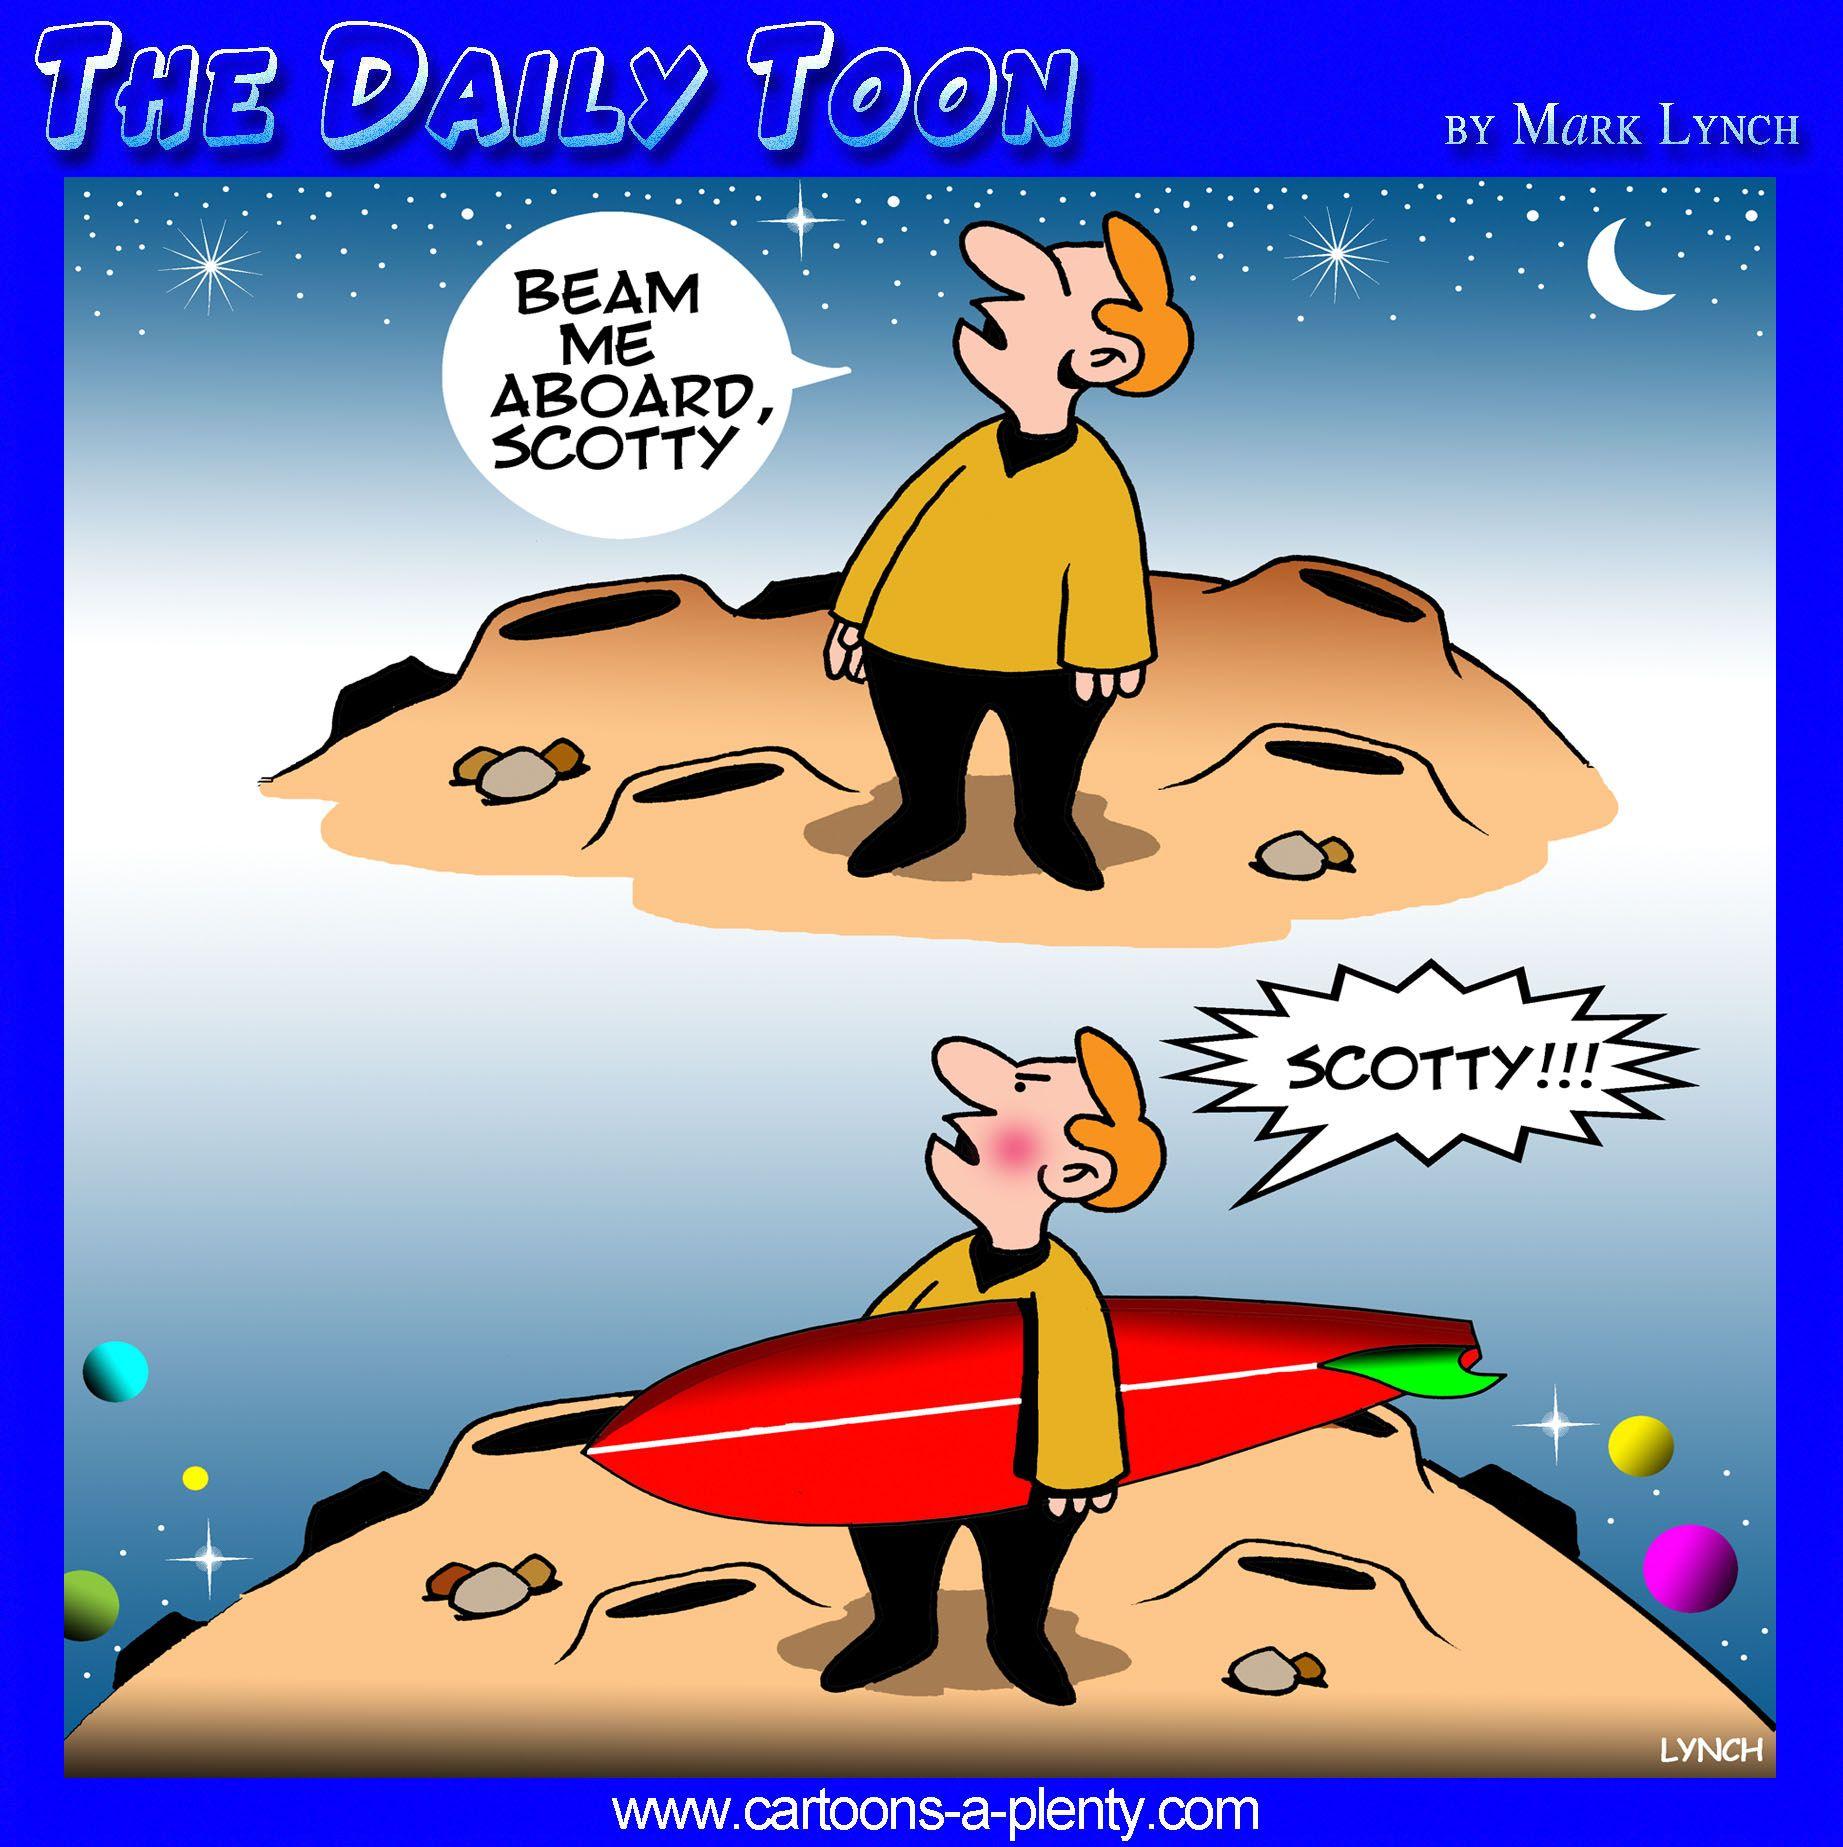 Beam Me Up Scotty Cartoon  The Daily Toon  Cartoon -4624